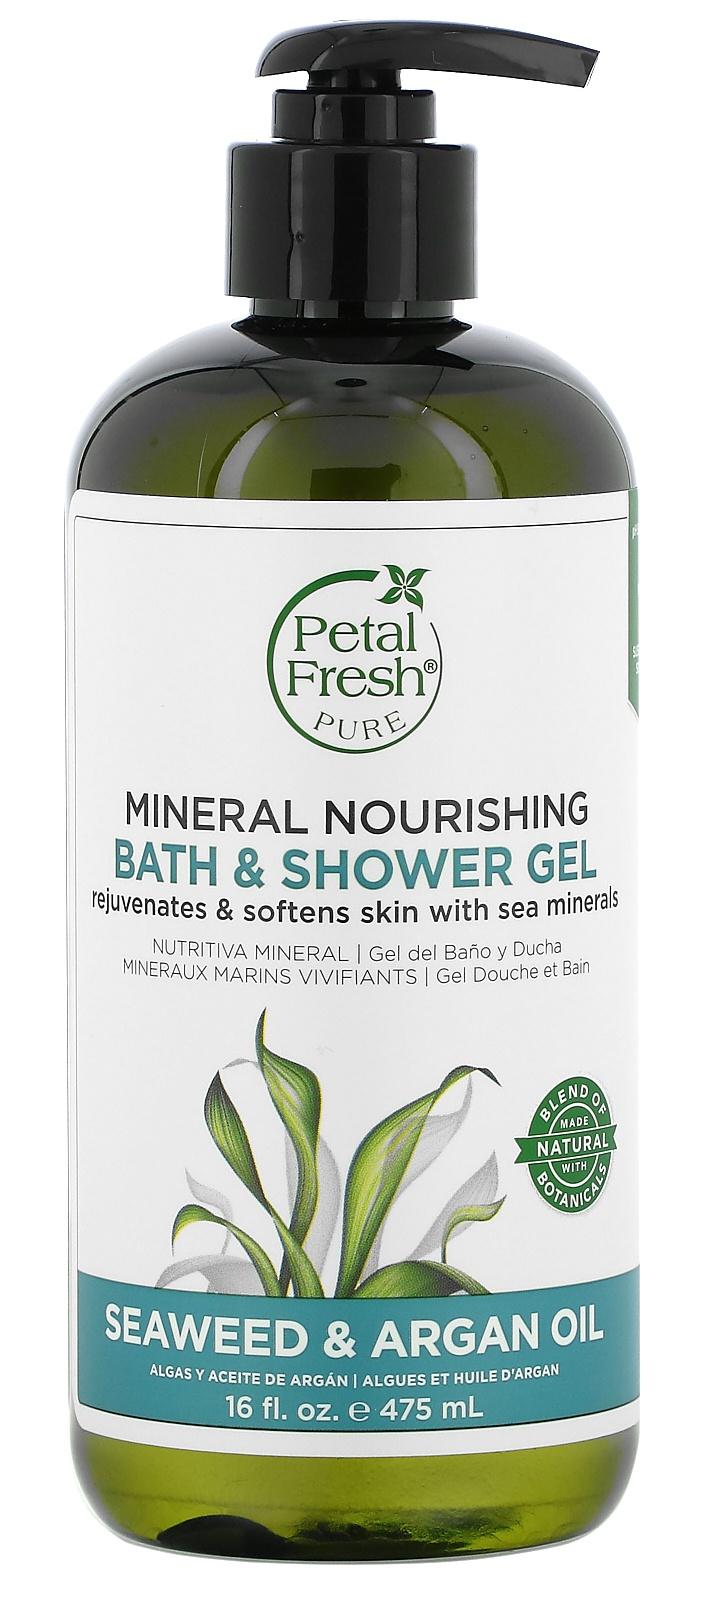 Petal Fresh Mineral Nourishing Bath & Shower Gel, Seaweed & Argan Oil